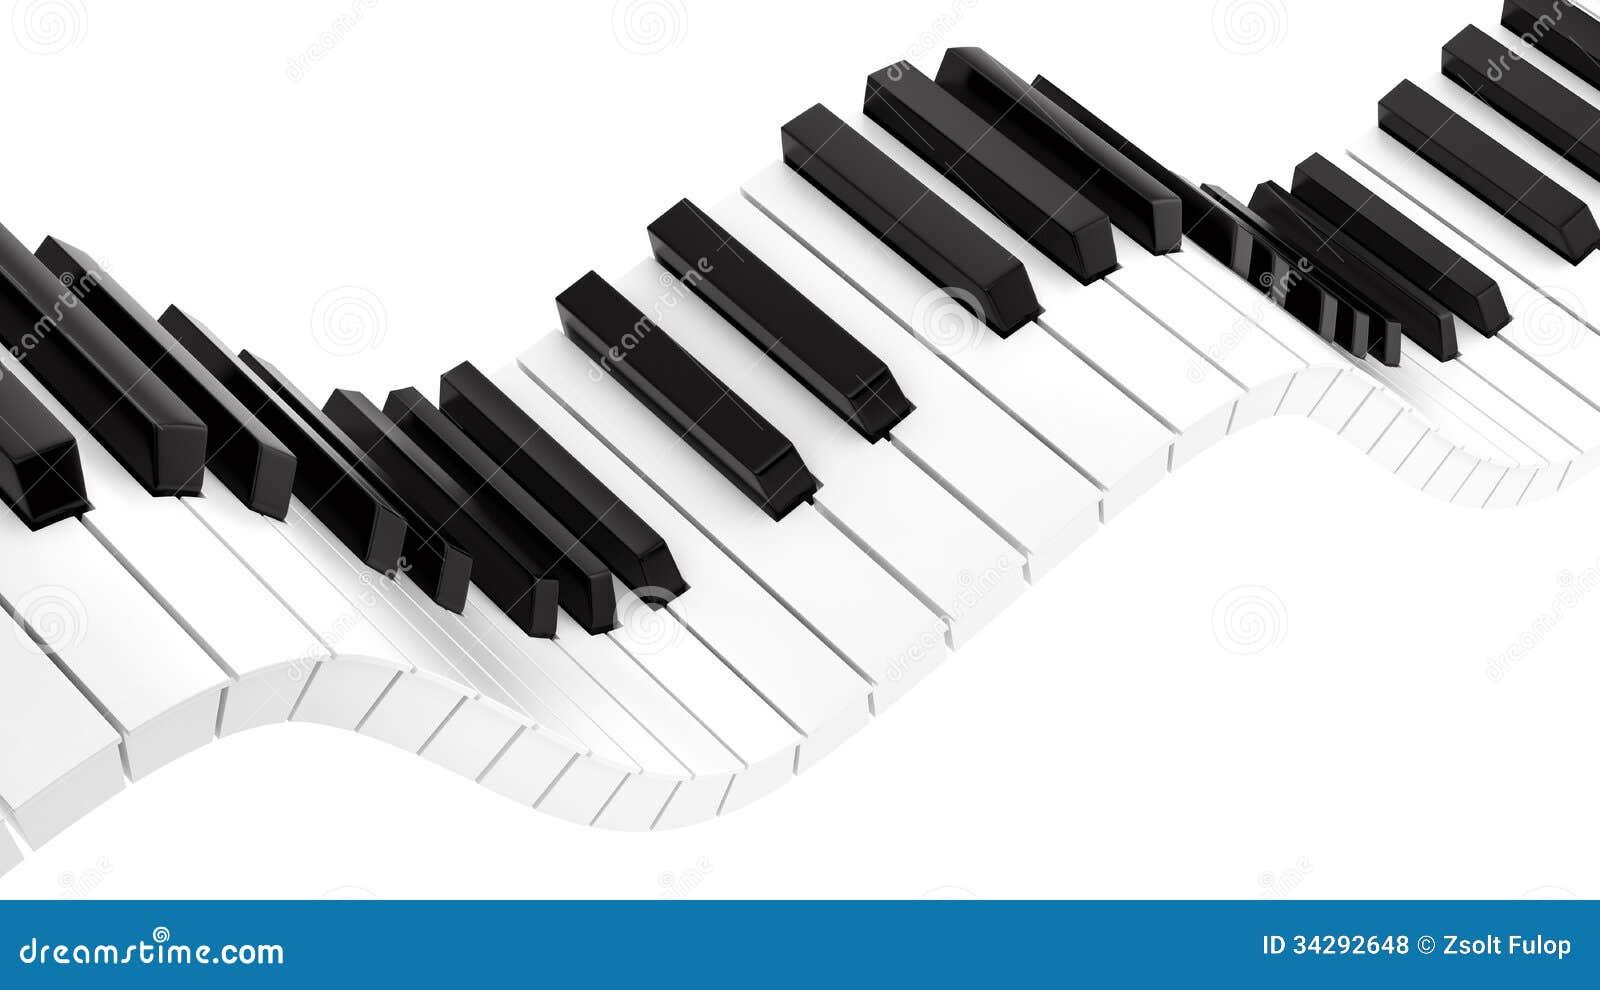 Wavy Piano Keyboard Royalty Free Stock Photos Image 34292648